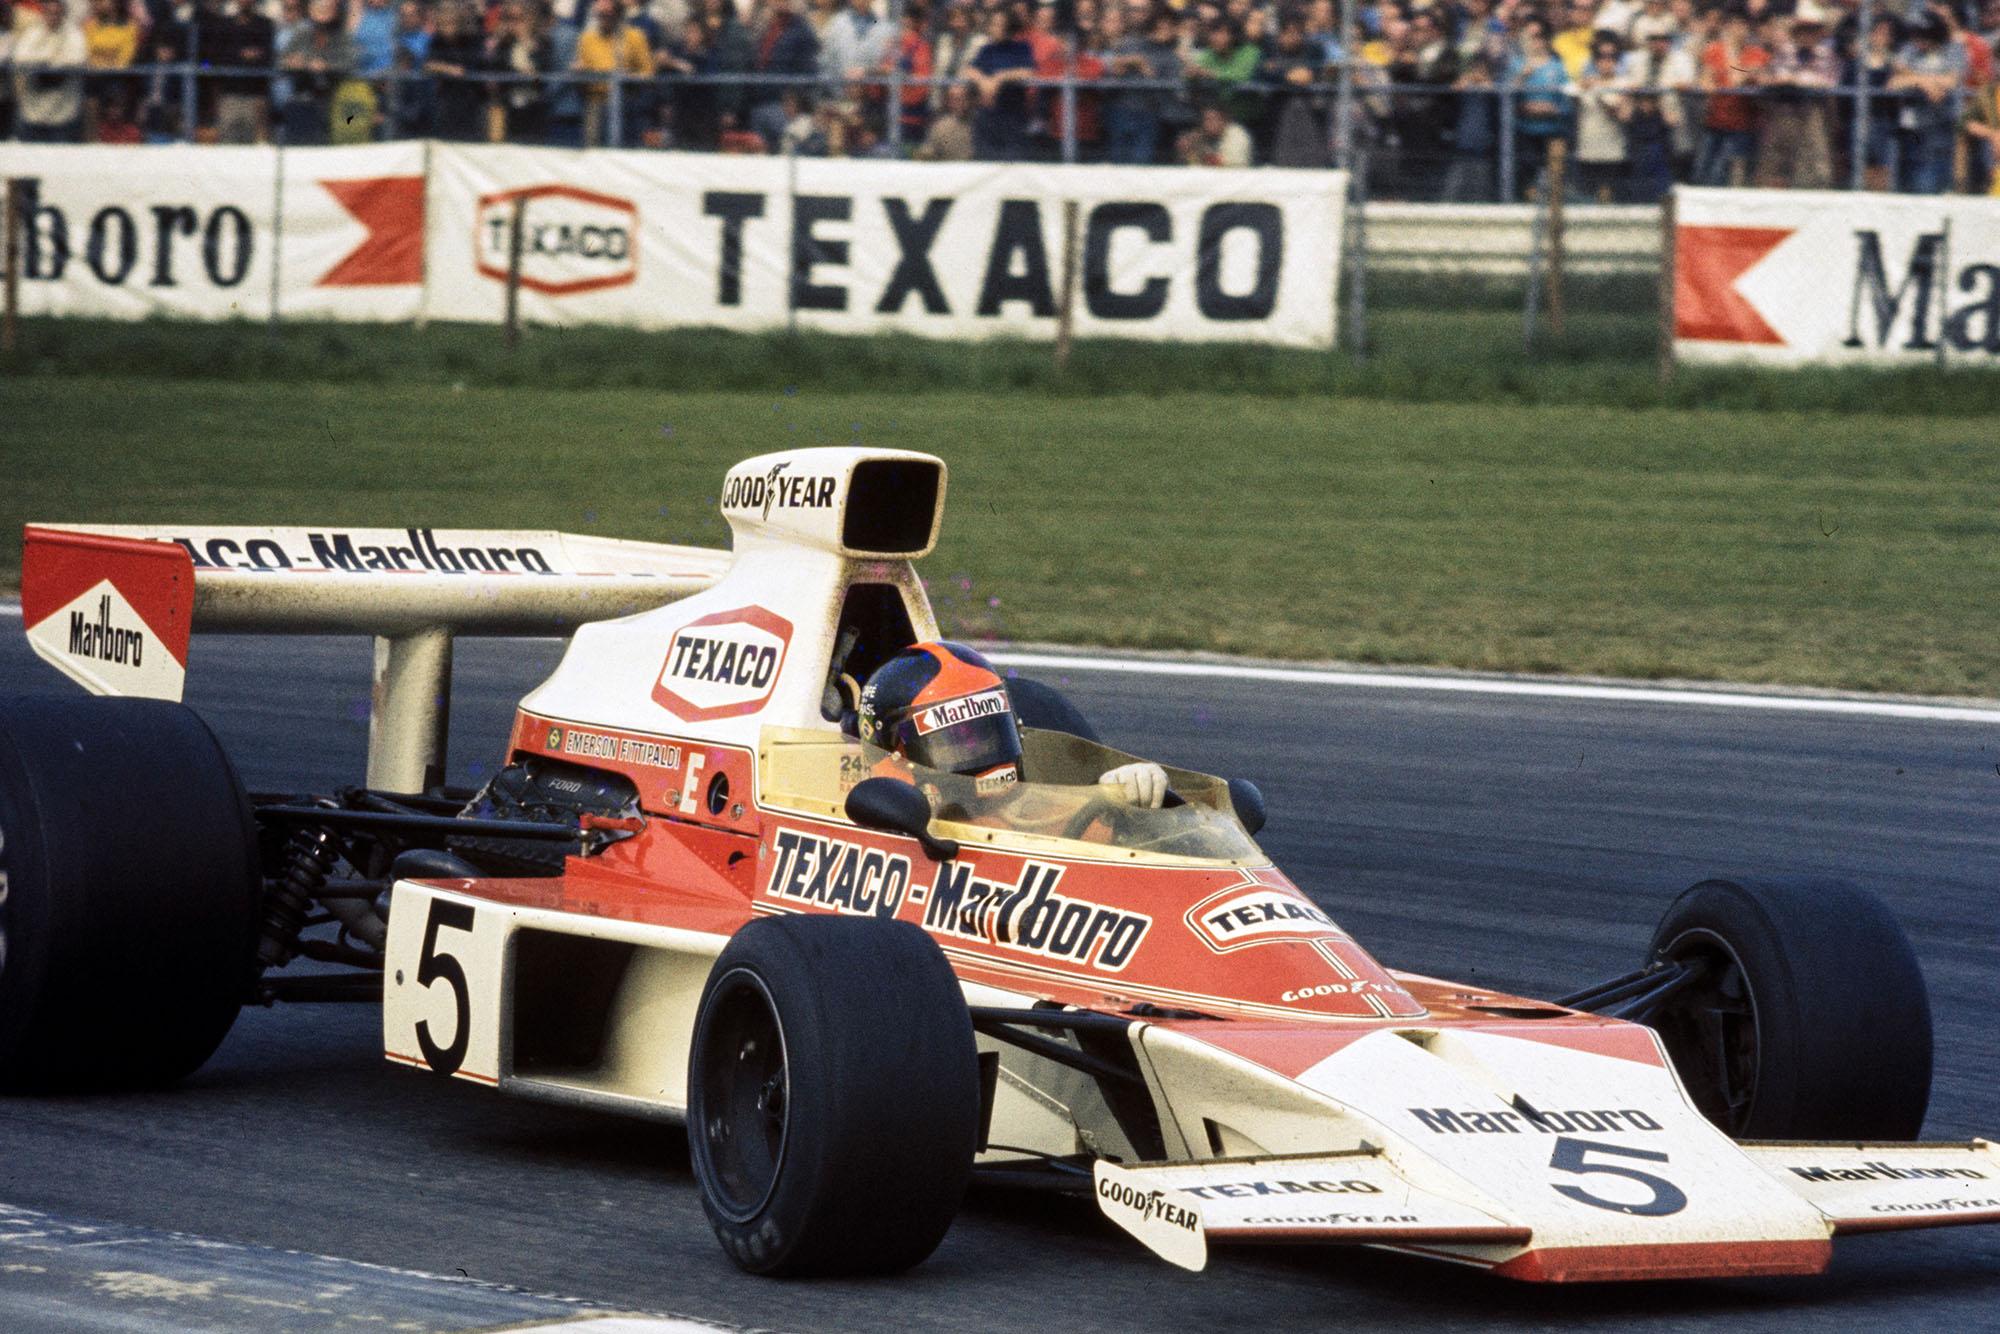 Emerson Fiitpaldi (McLAren) on his way to finishing first at the 1974 Belgian Grand Prix, Zolder.